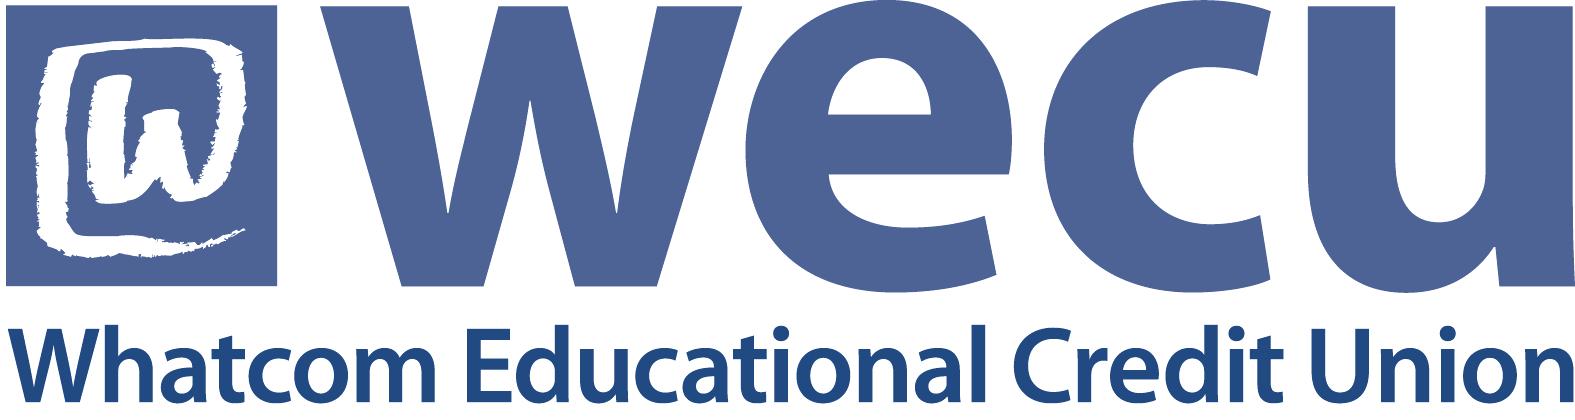 Whatcom Educational Credit Union